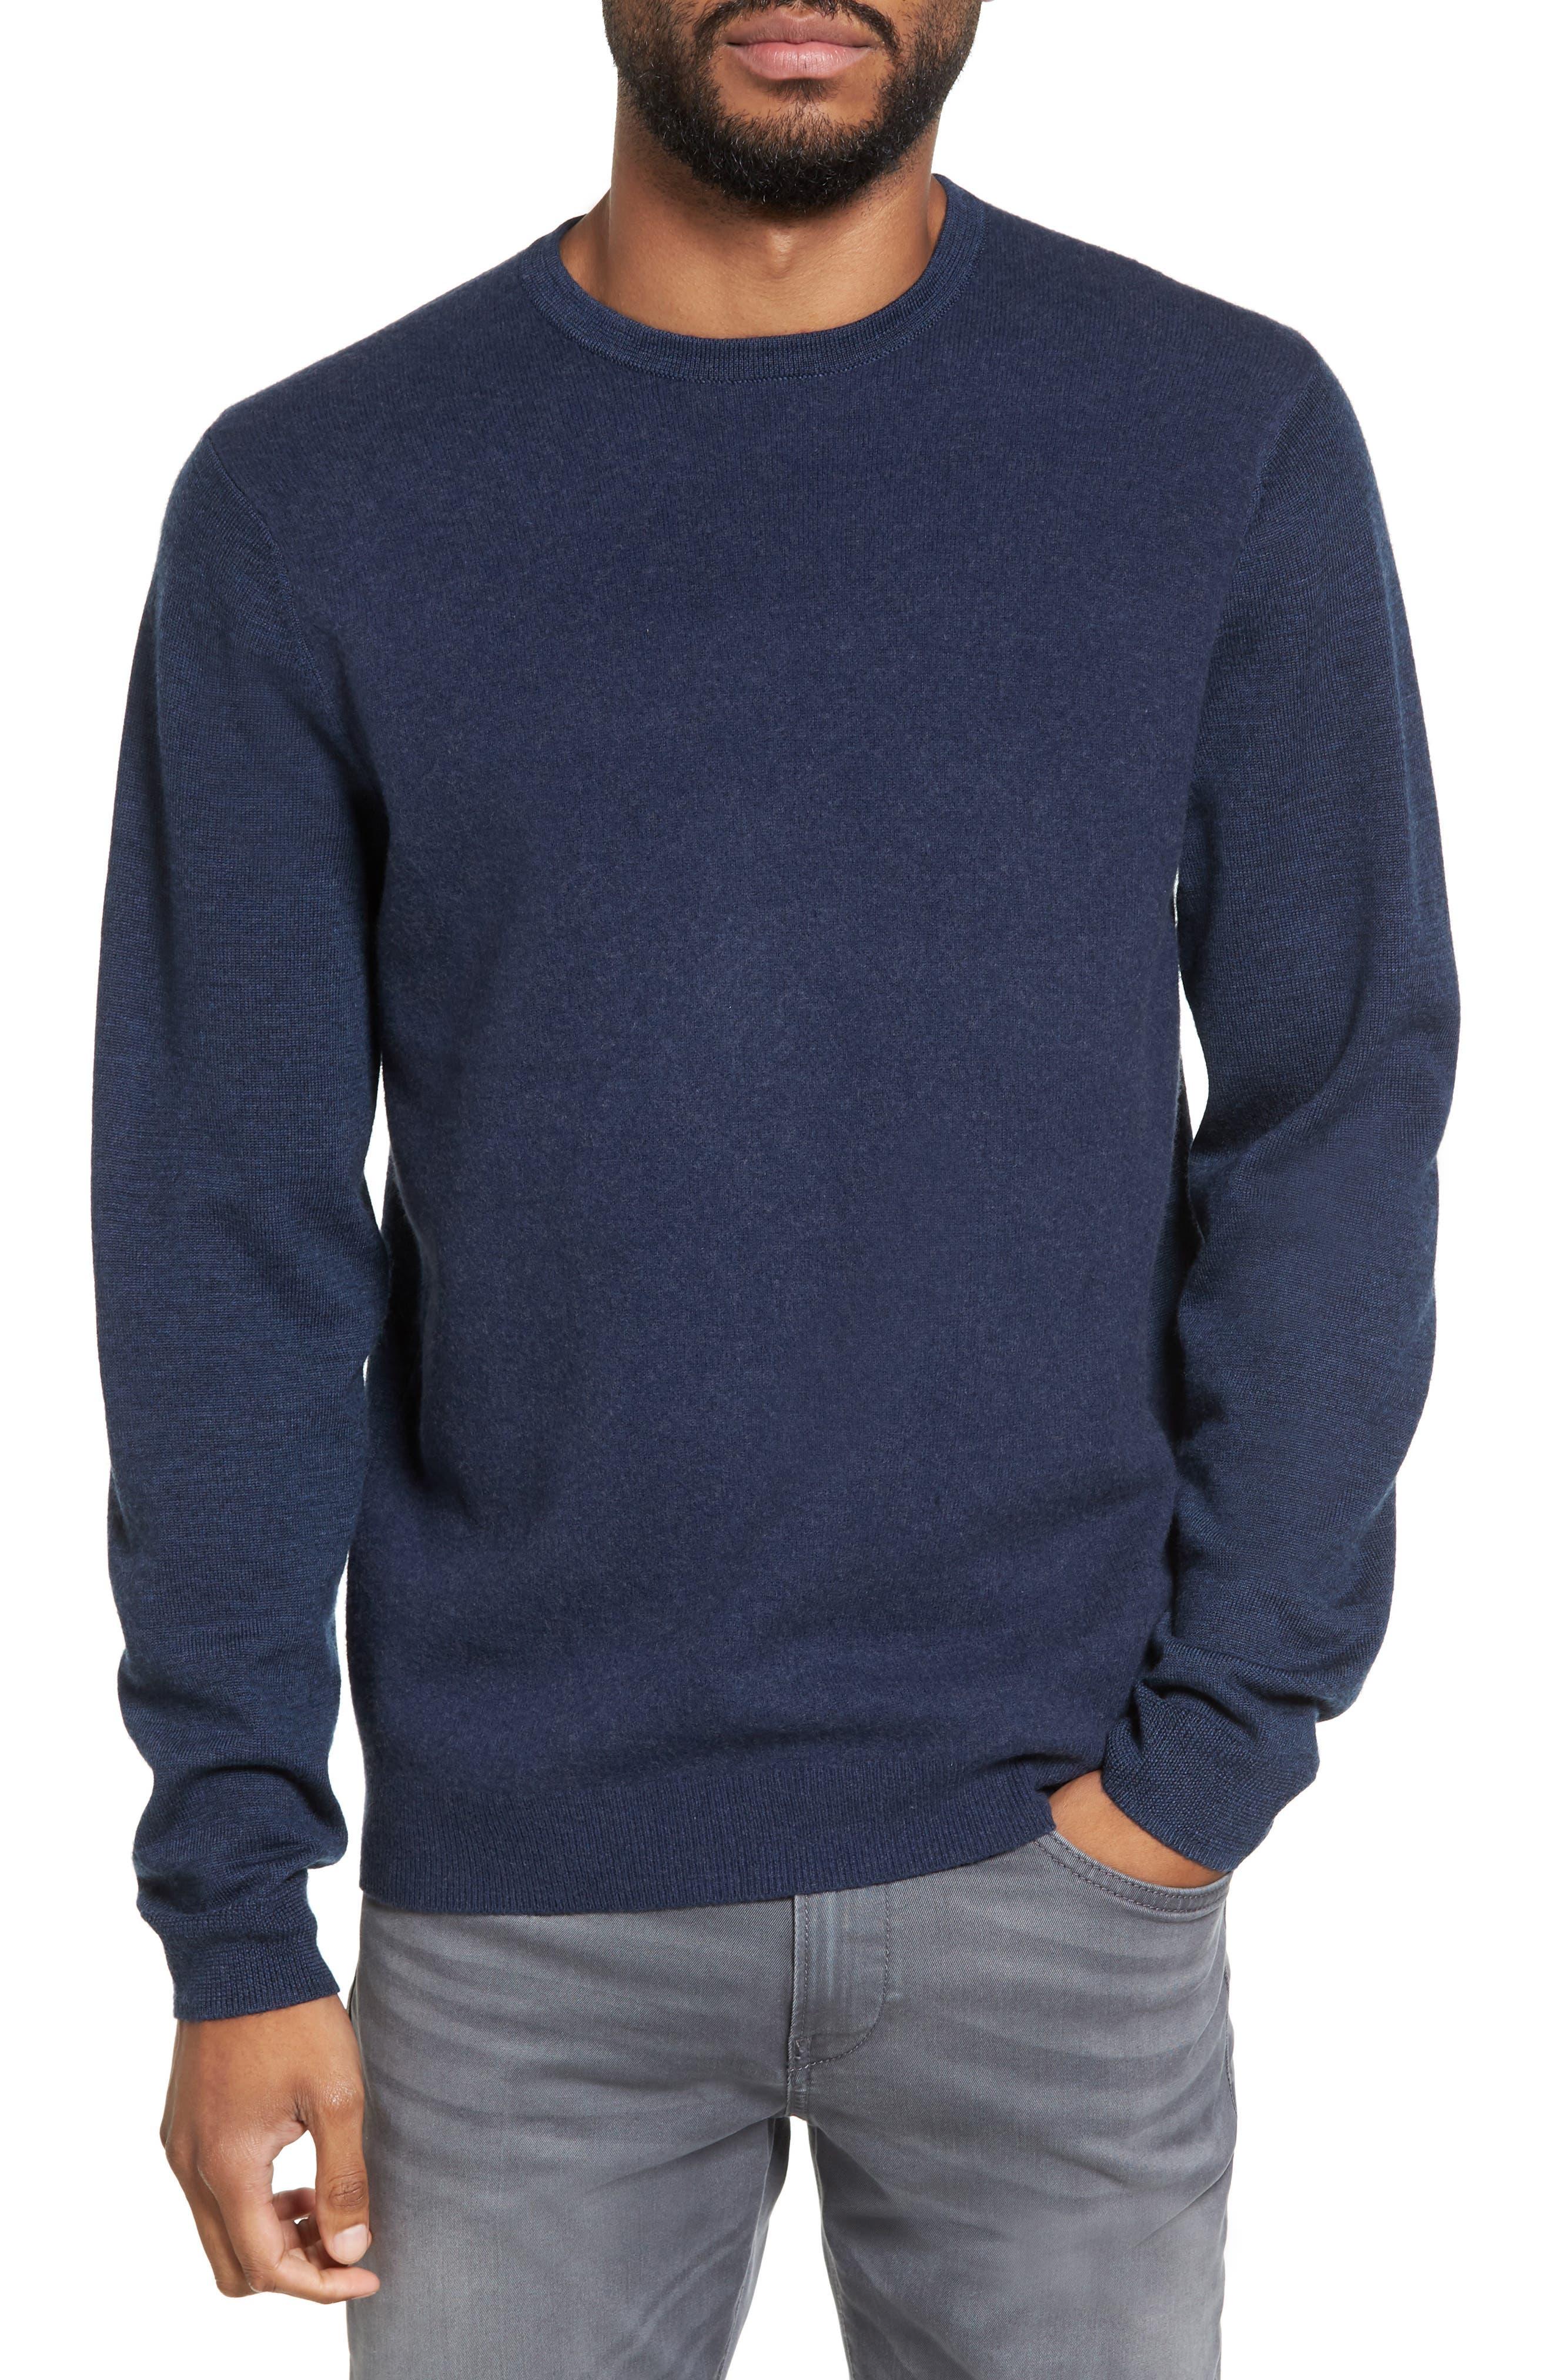 Main Image - Calibrate Merino Wool Blend Sweater